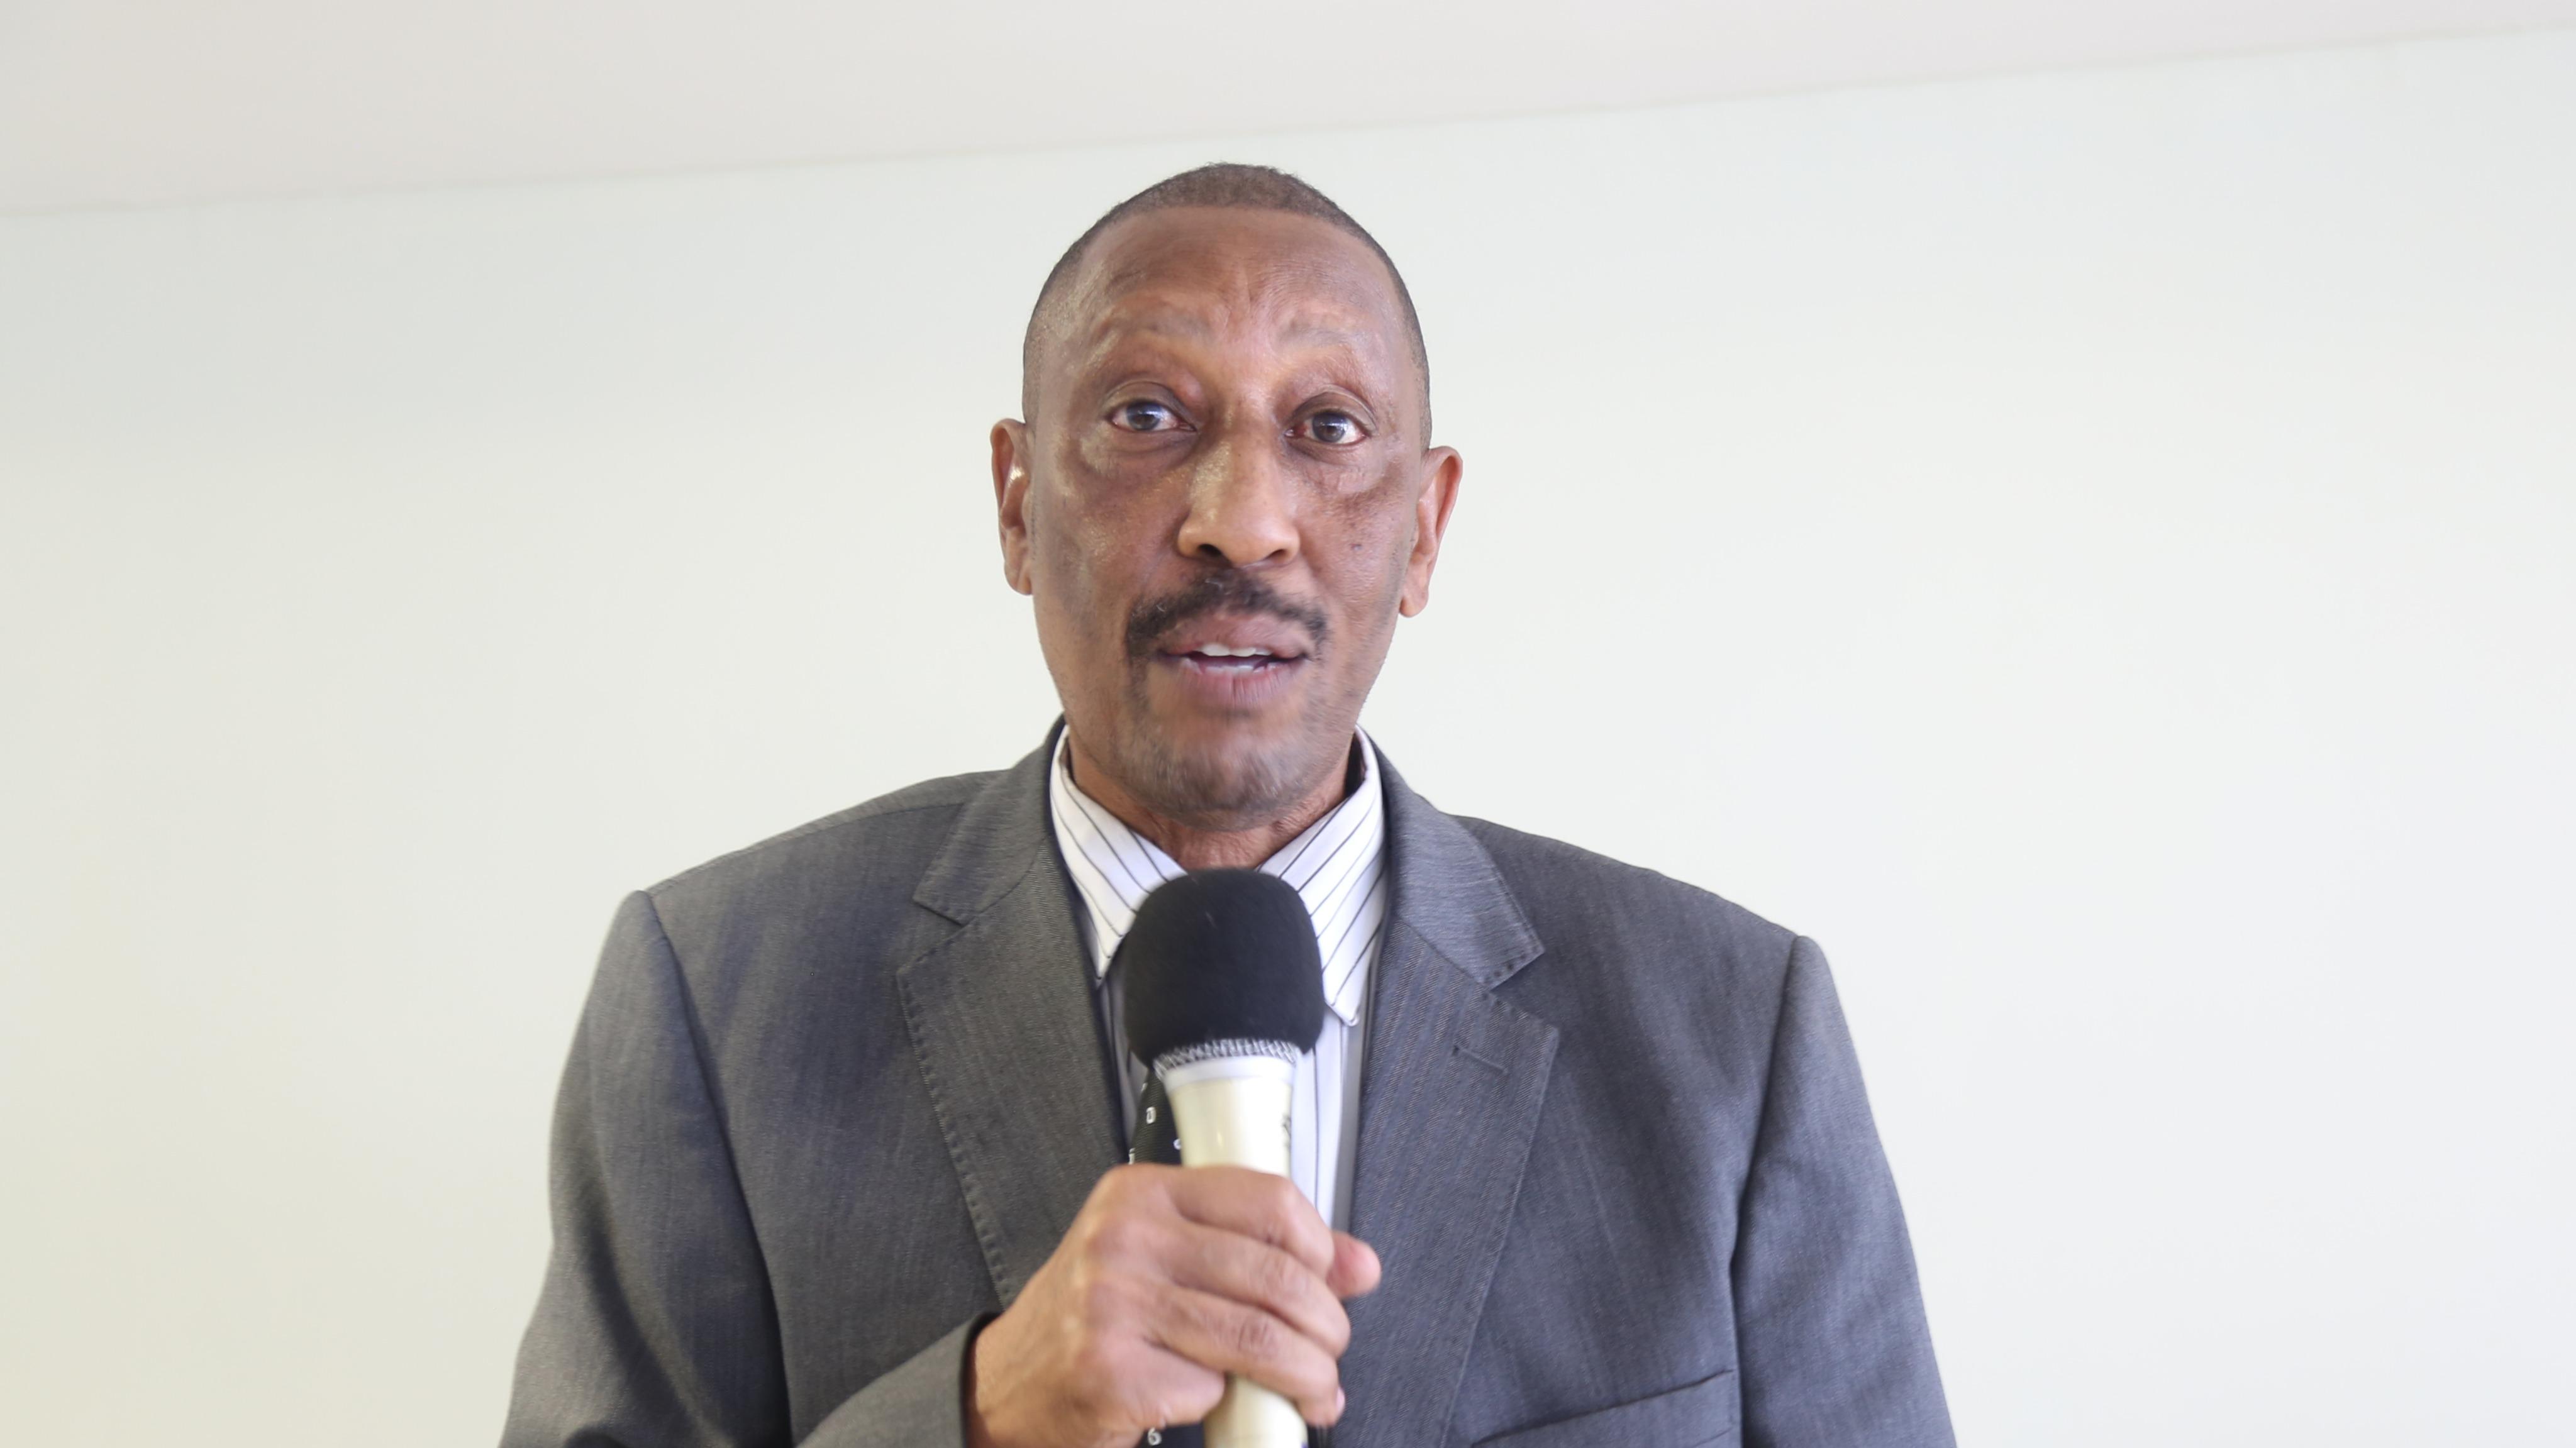 Mhandisi Malongo: Tutaboresha mafunzo ya wakaguzi wa mazingira